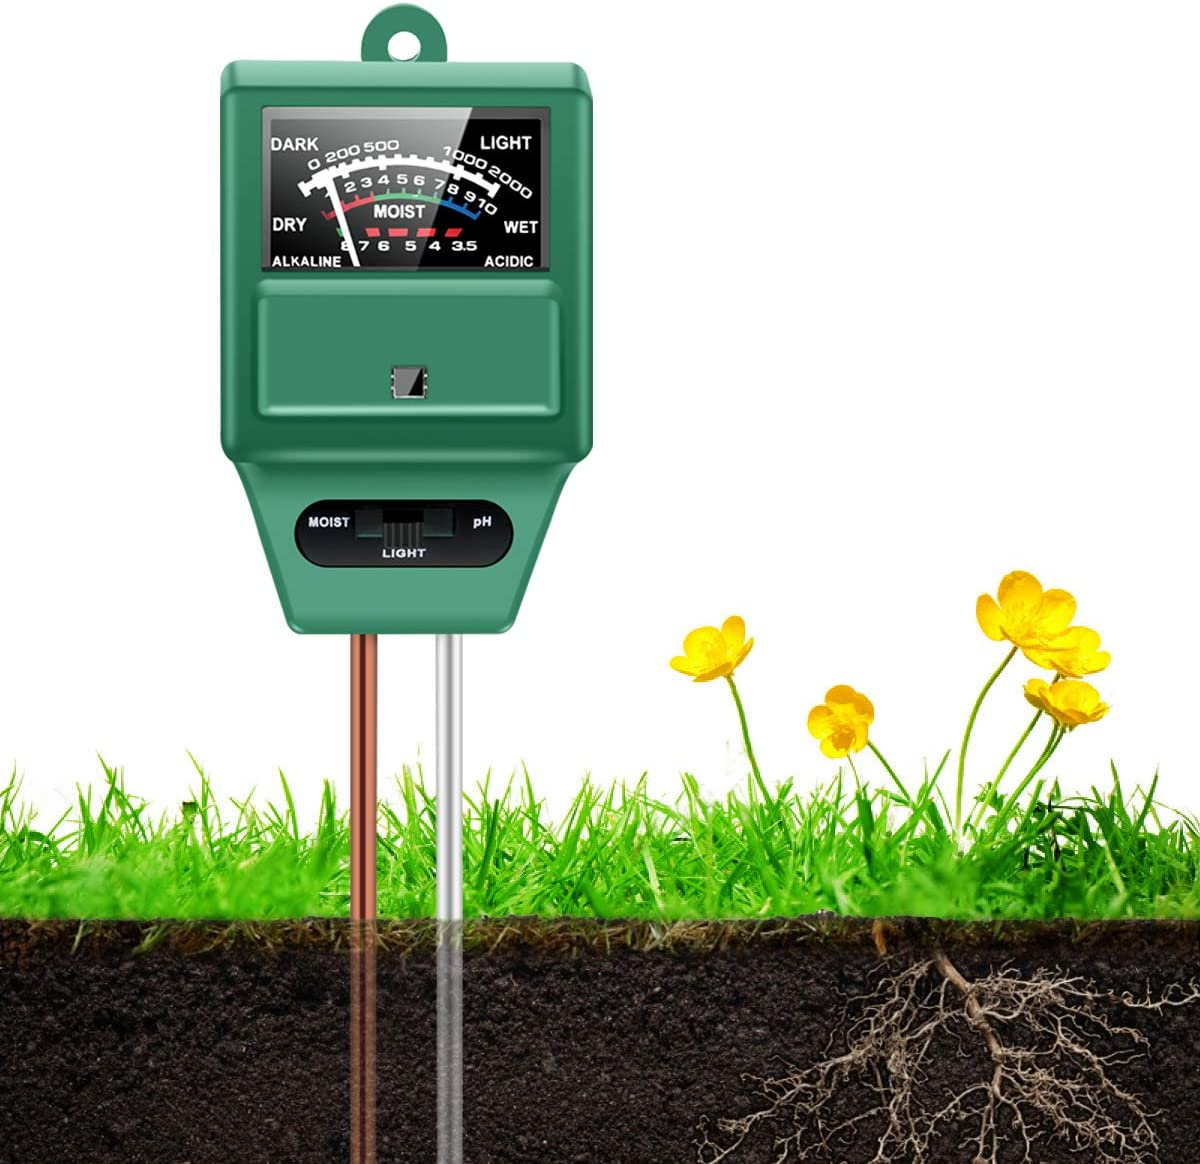 Hayi 3-in-1 Soil Moisture Meter